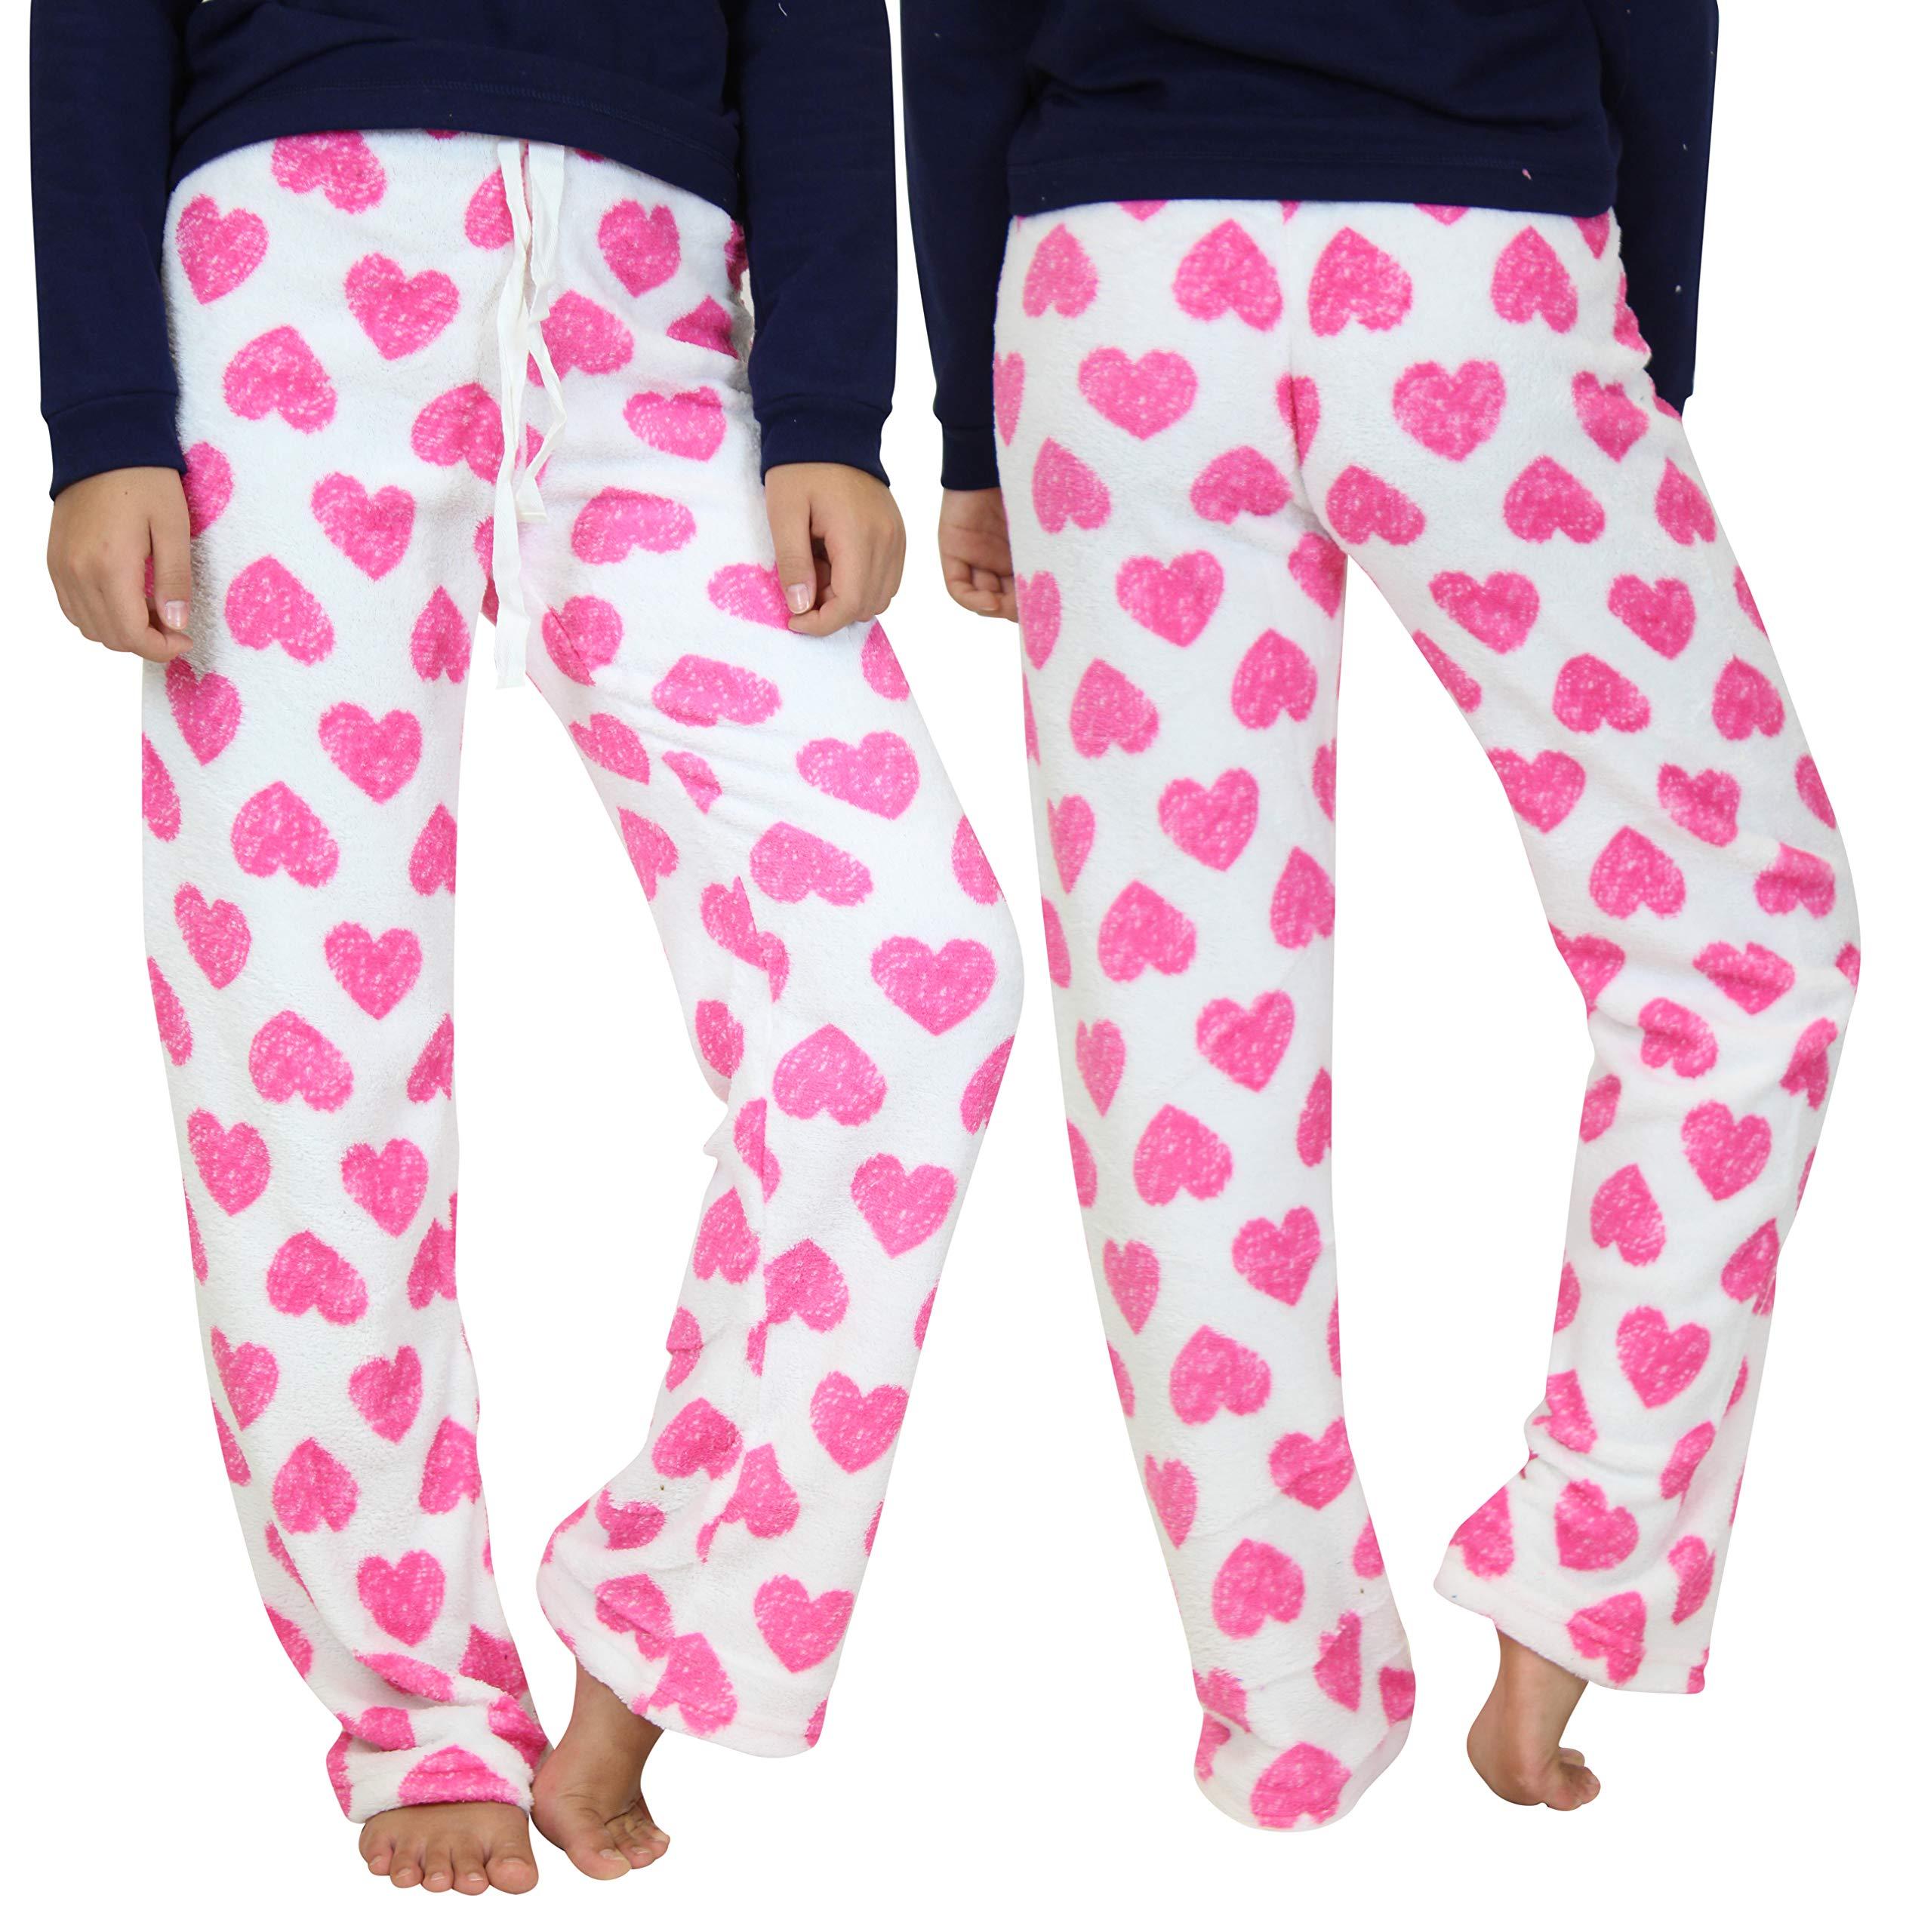 3 Pack:women'S Super-Soft Plush Fleece Pajama/Lounge Pants -